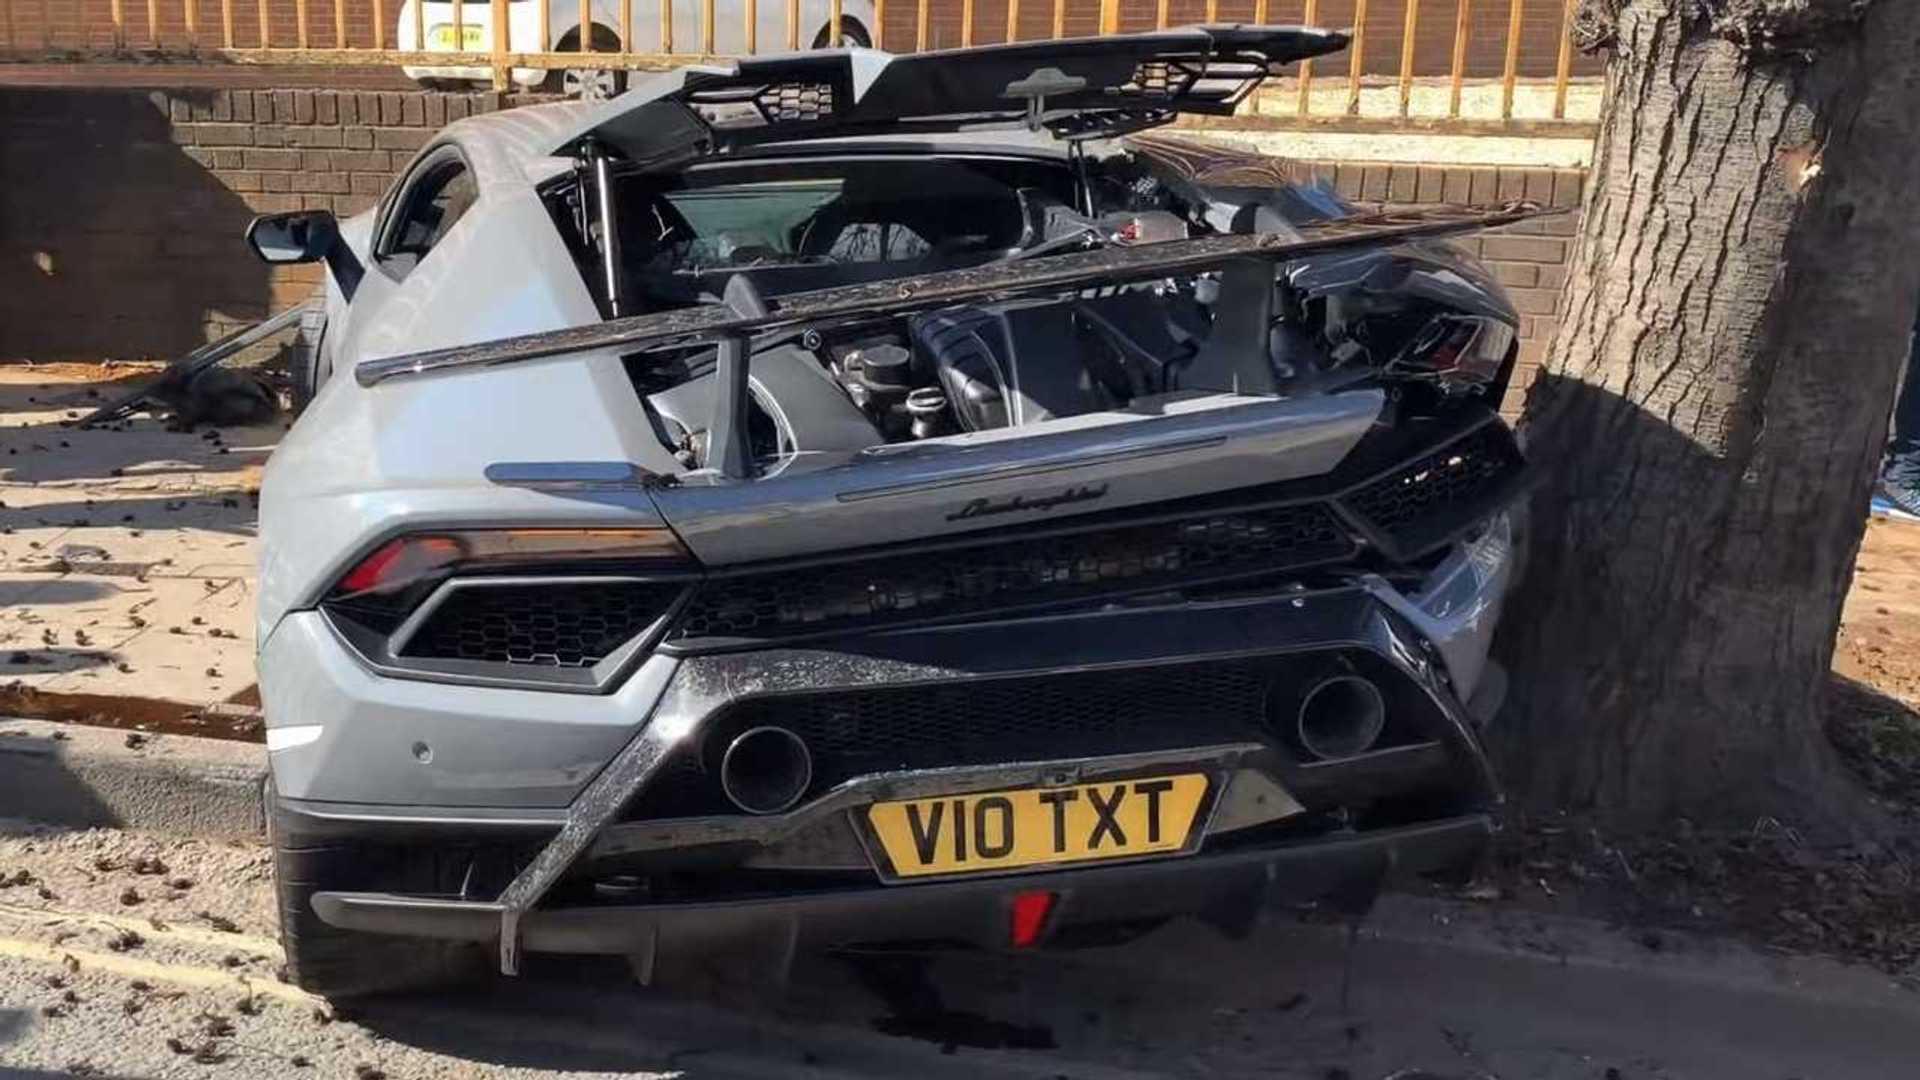 Huracan Performante Wrecked At Supercar Meet Update